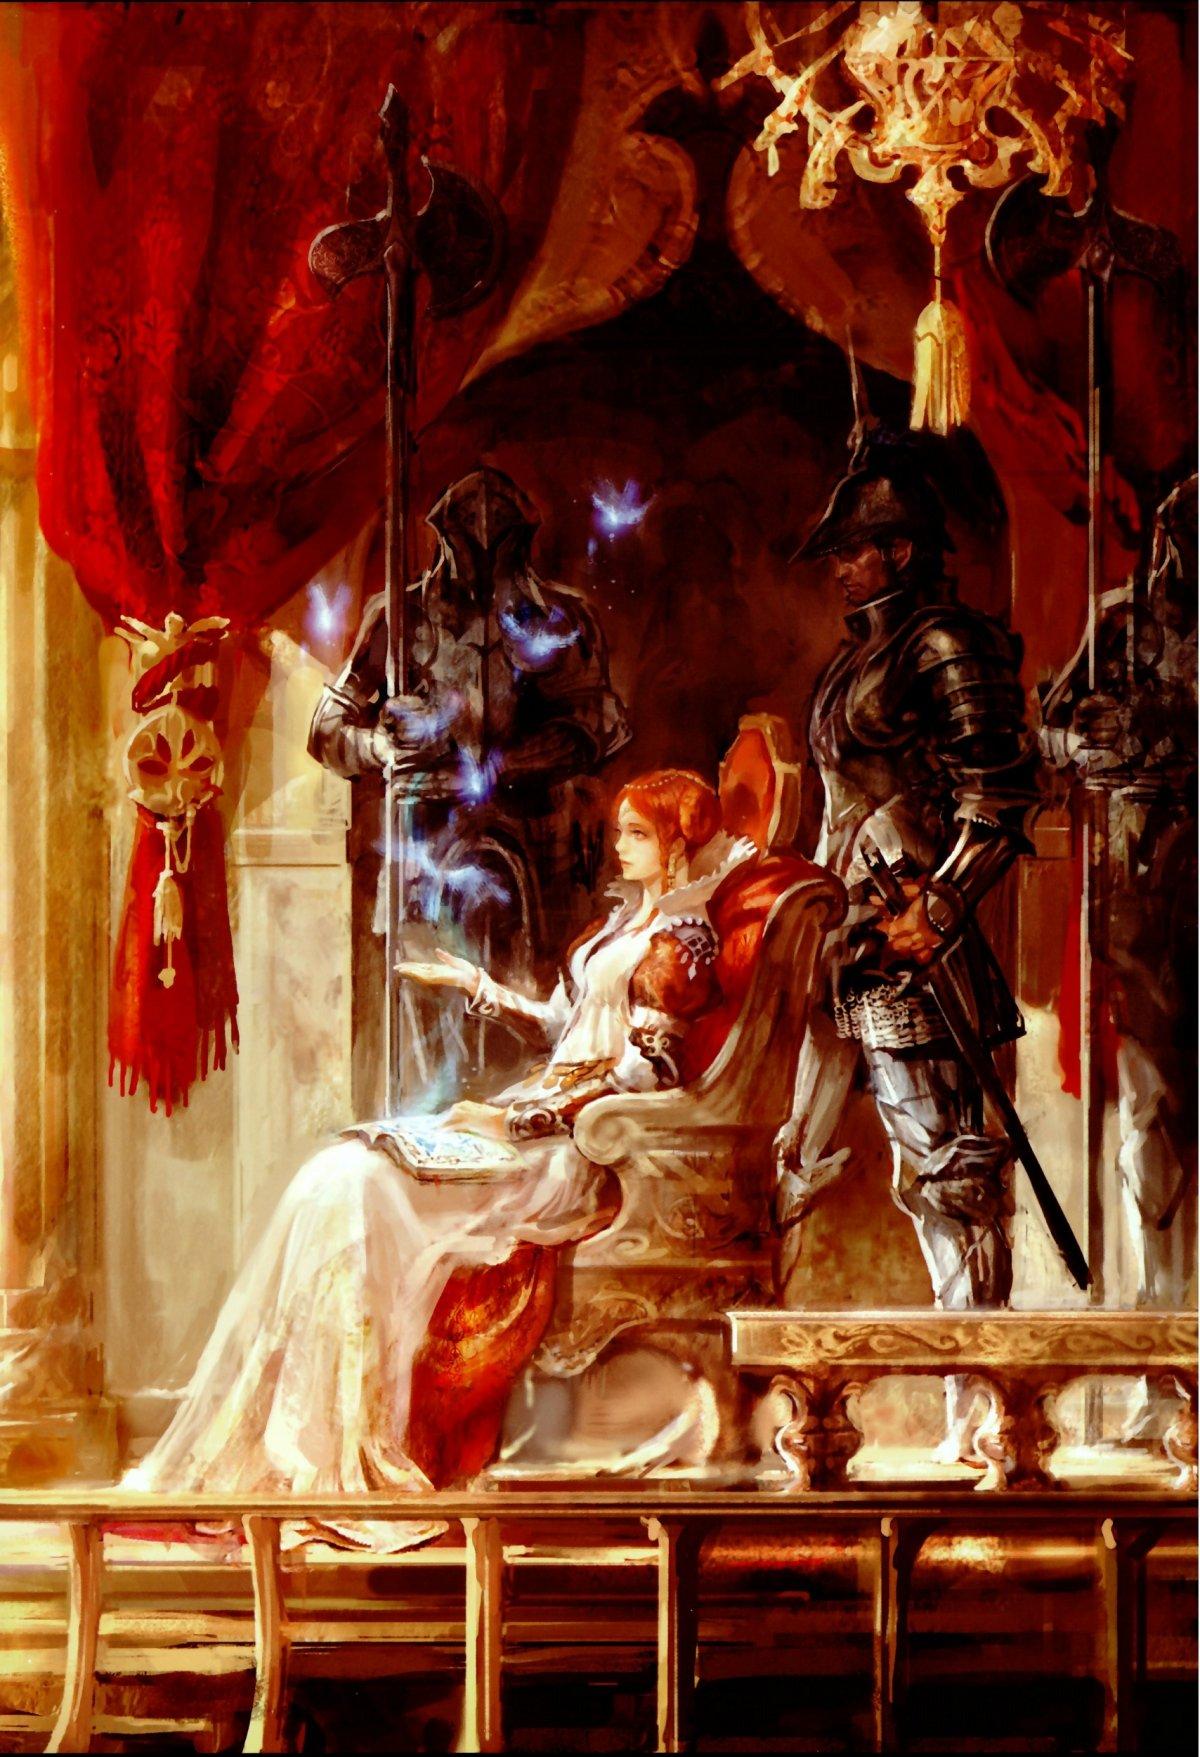 Сидит на троне